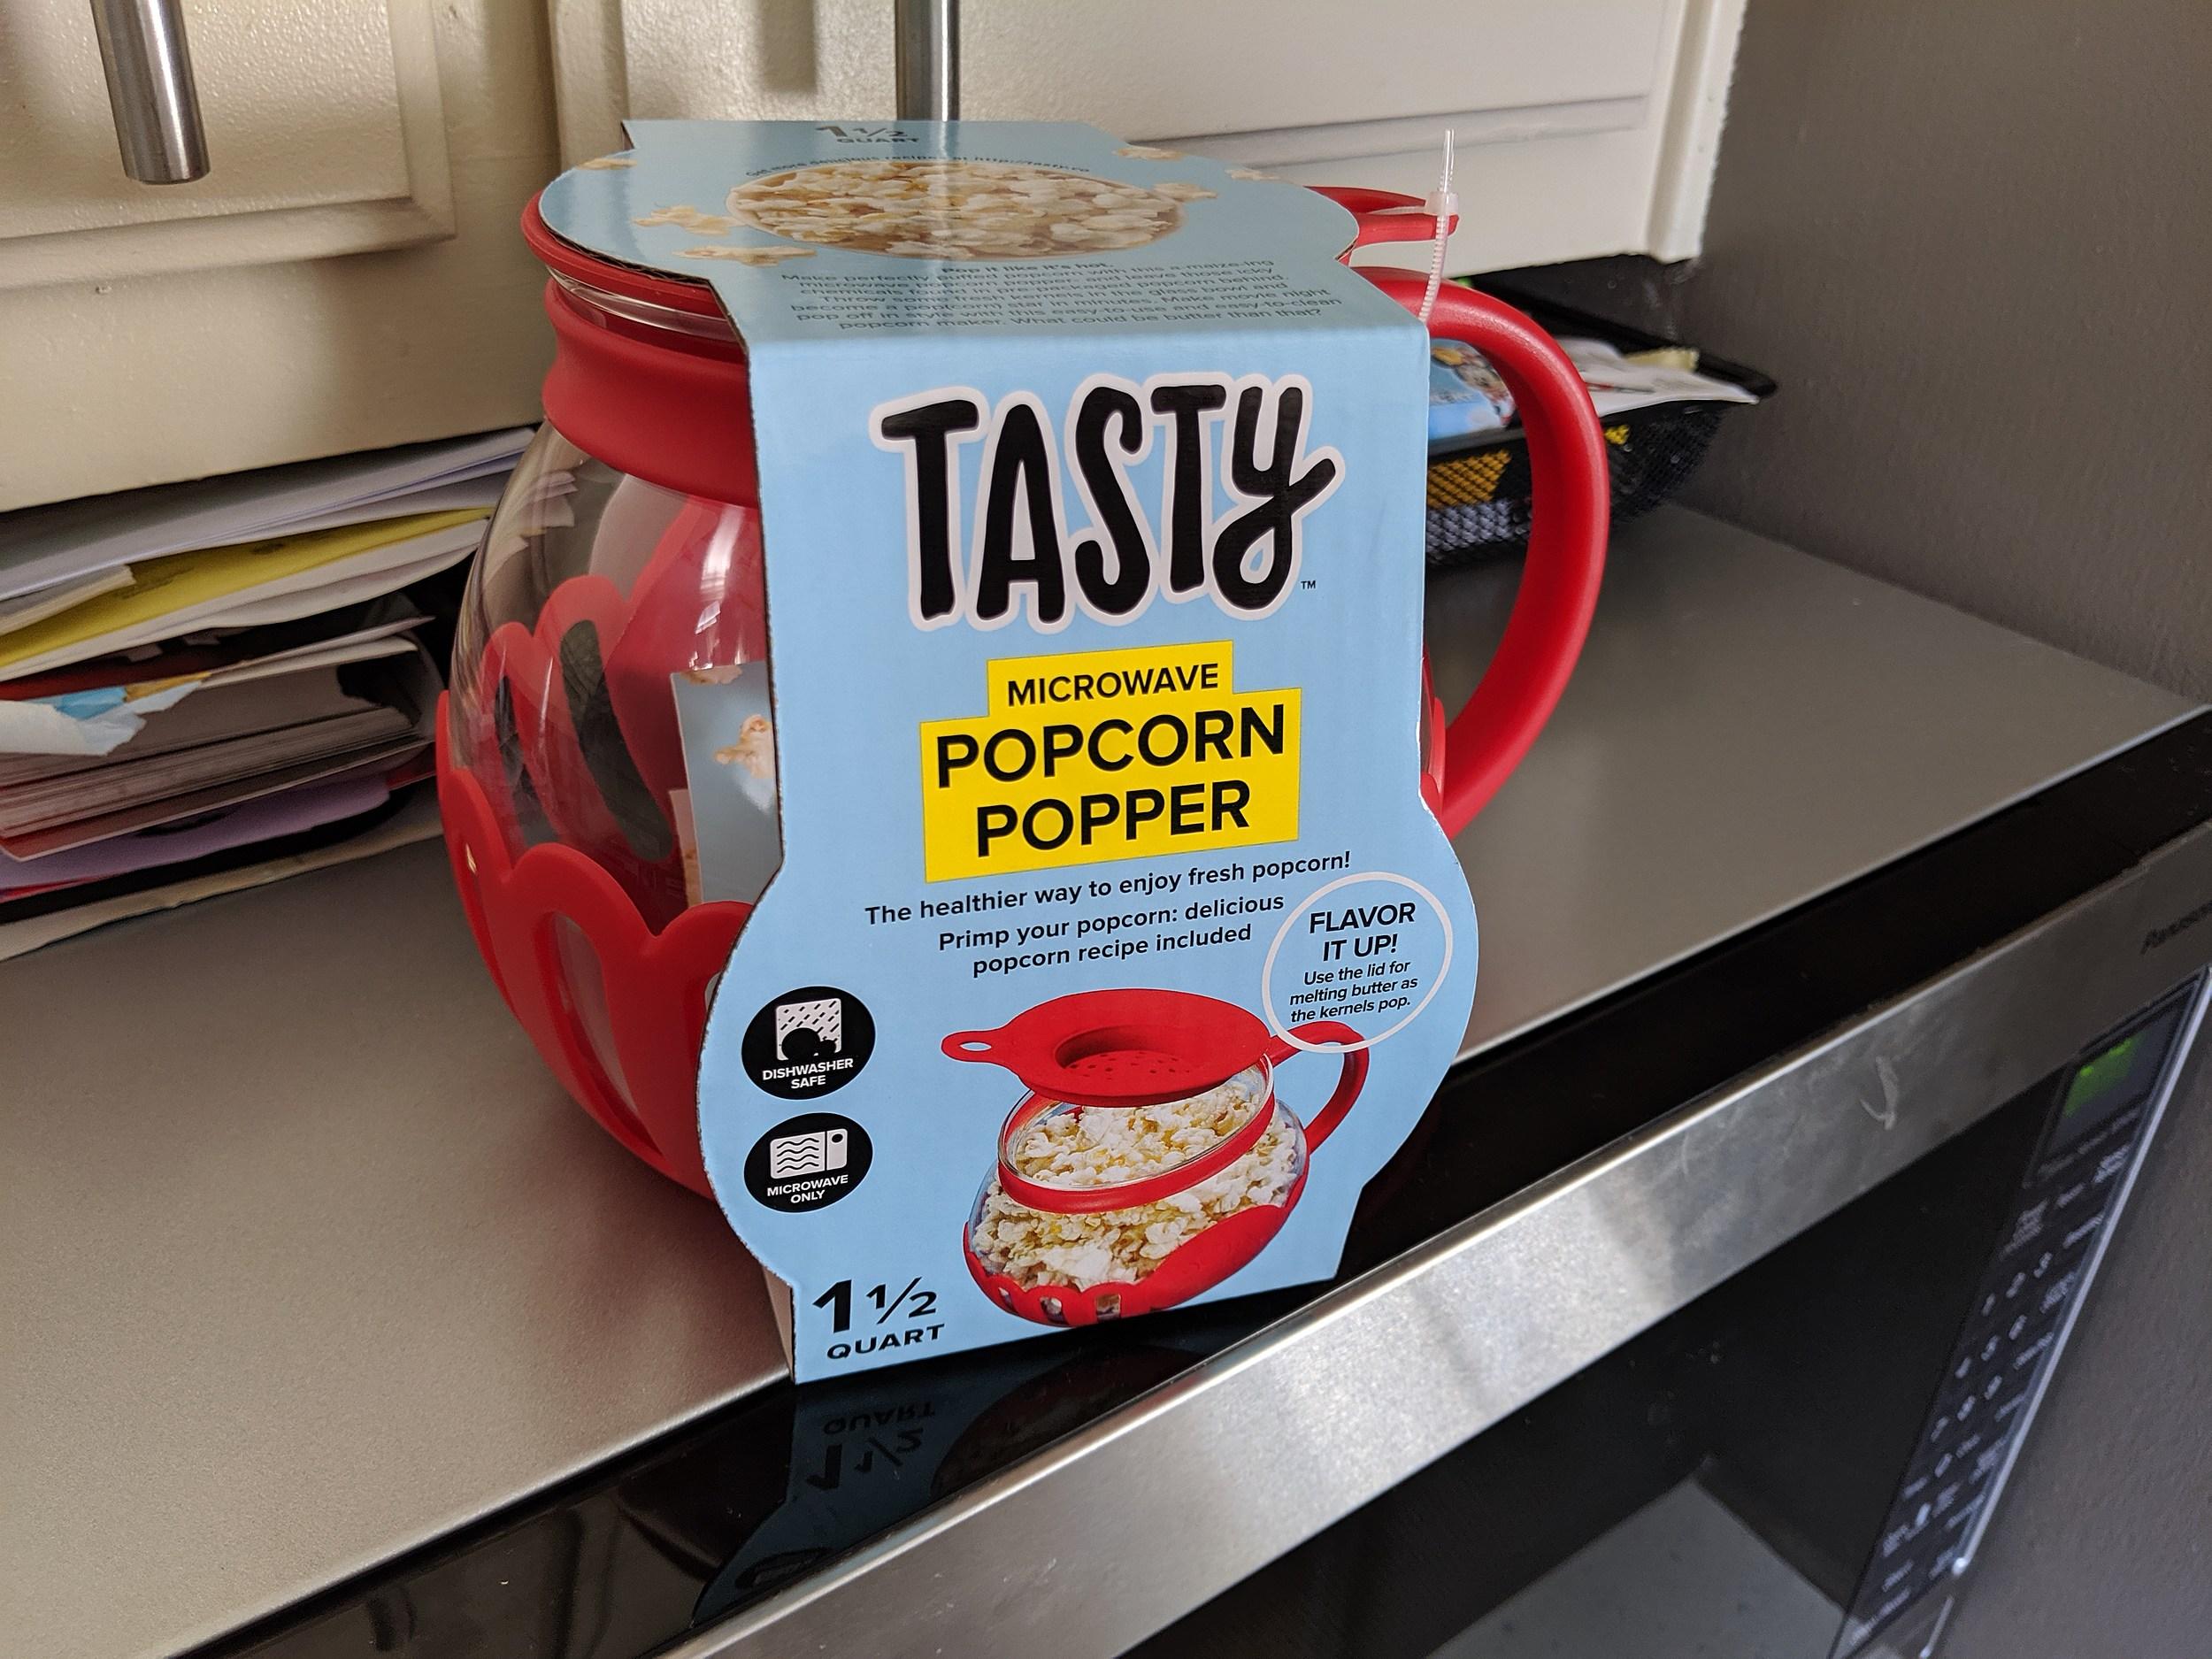 the tasty brand microwave popcorn popper